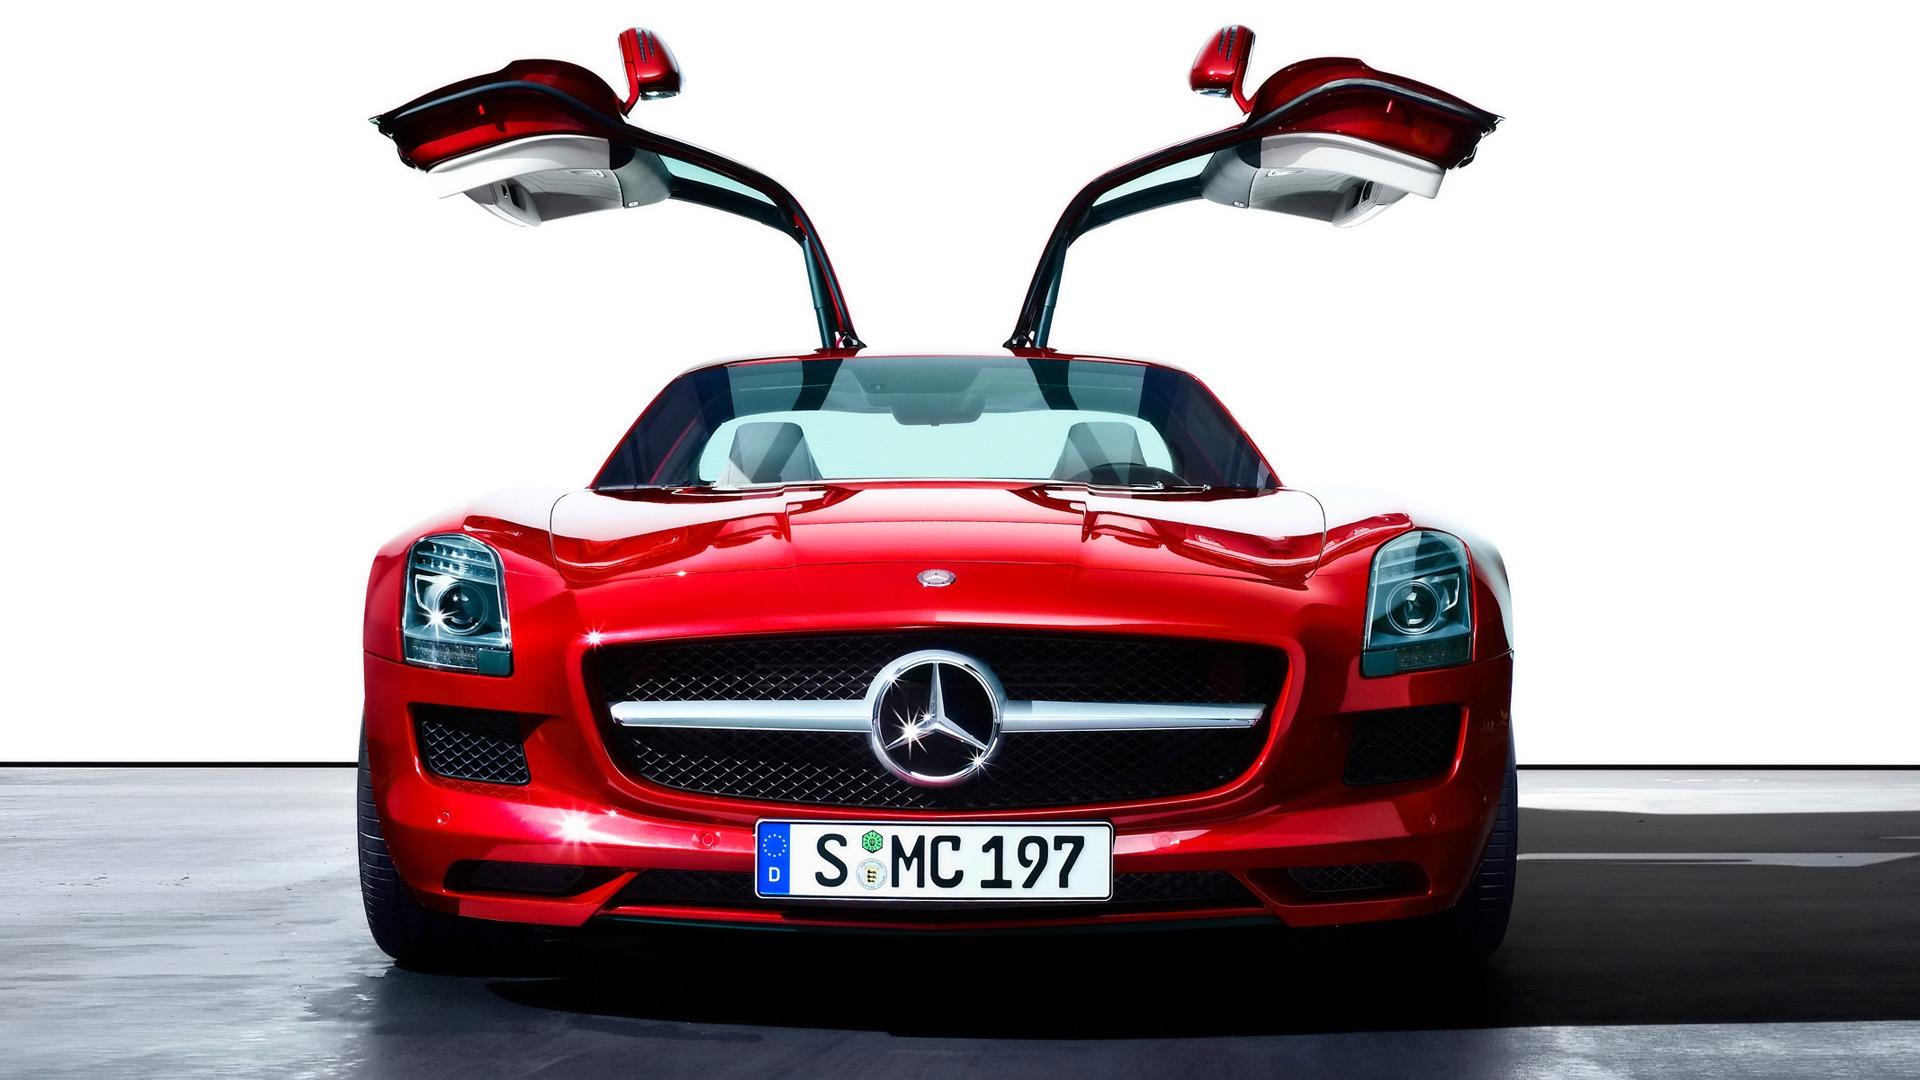 Red Mercedes Sls Amg Wallpaper Mercedes Cars Wallpapers In Jpg